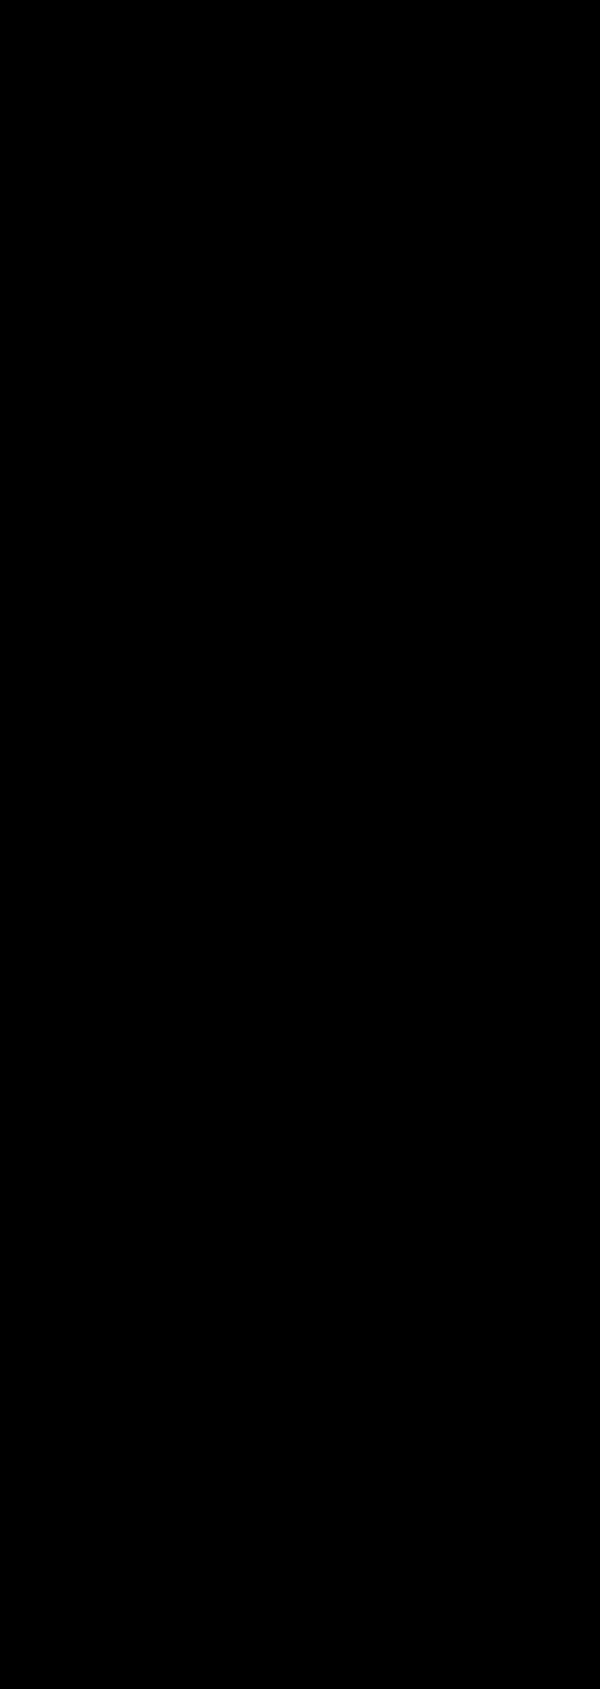 Person Outline Clipart - Clipart Suggest